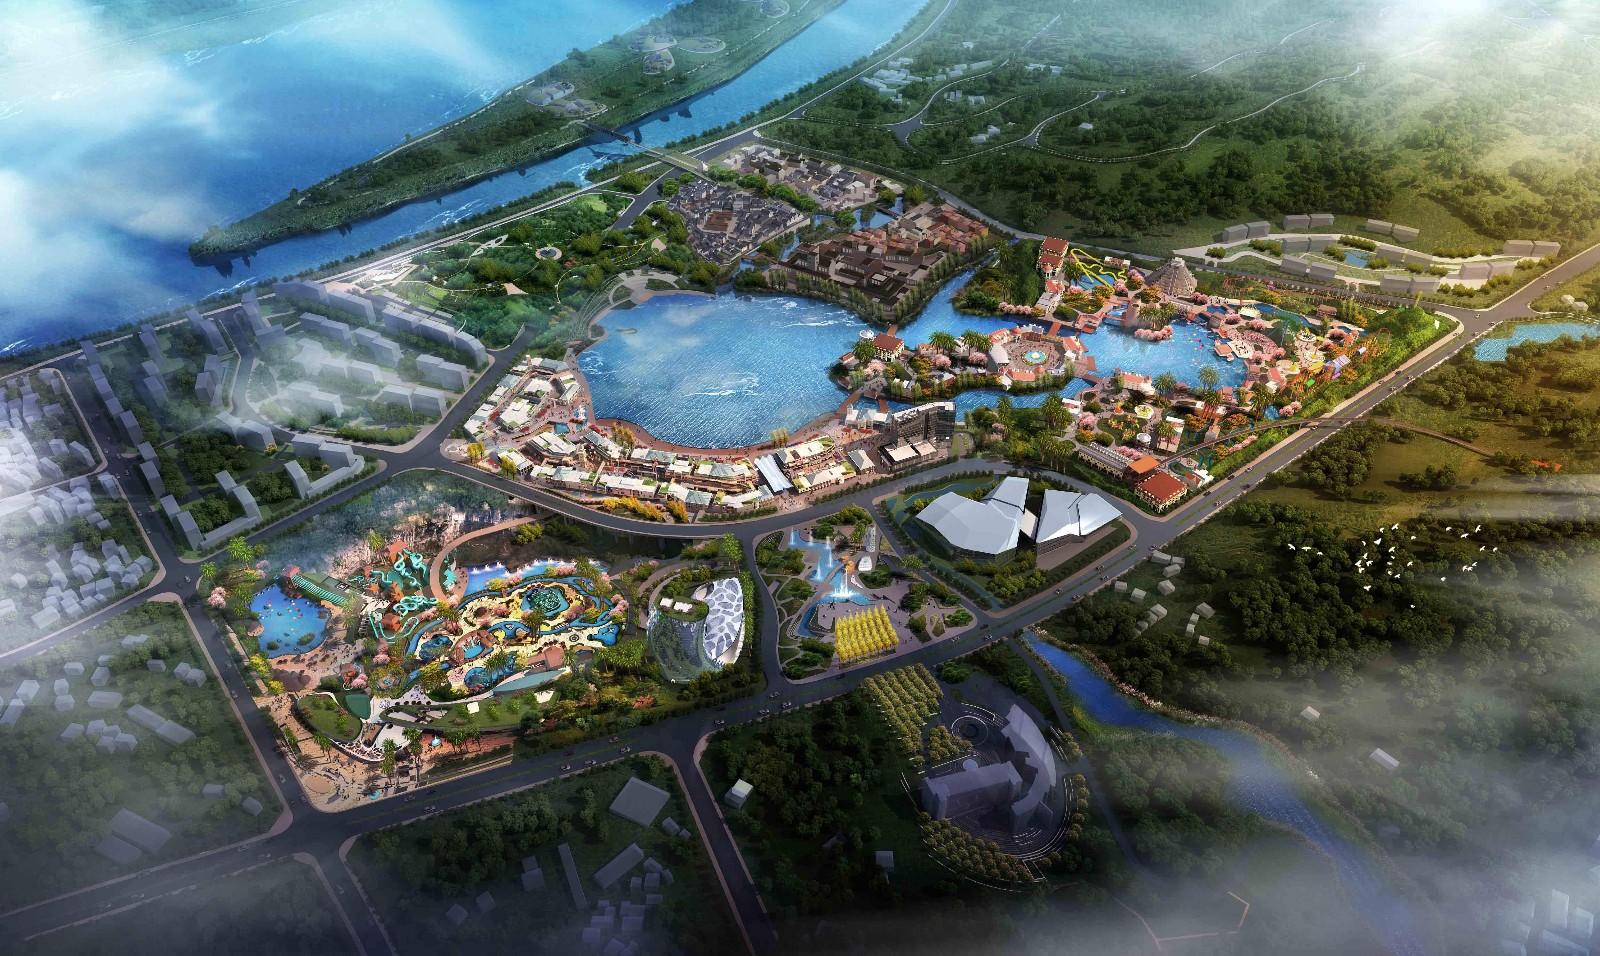 xingjiangyuan water park.jpg